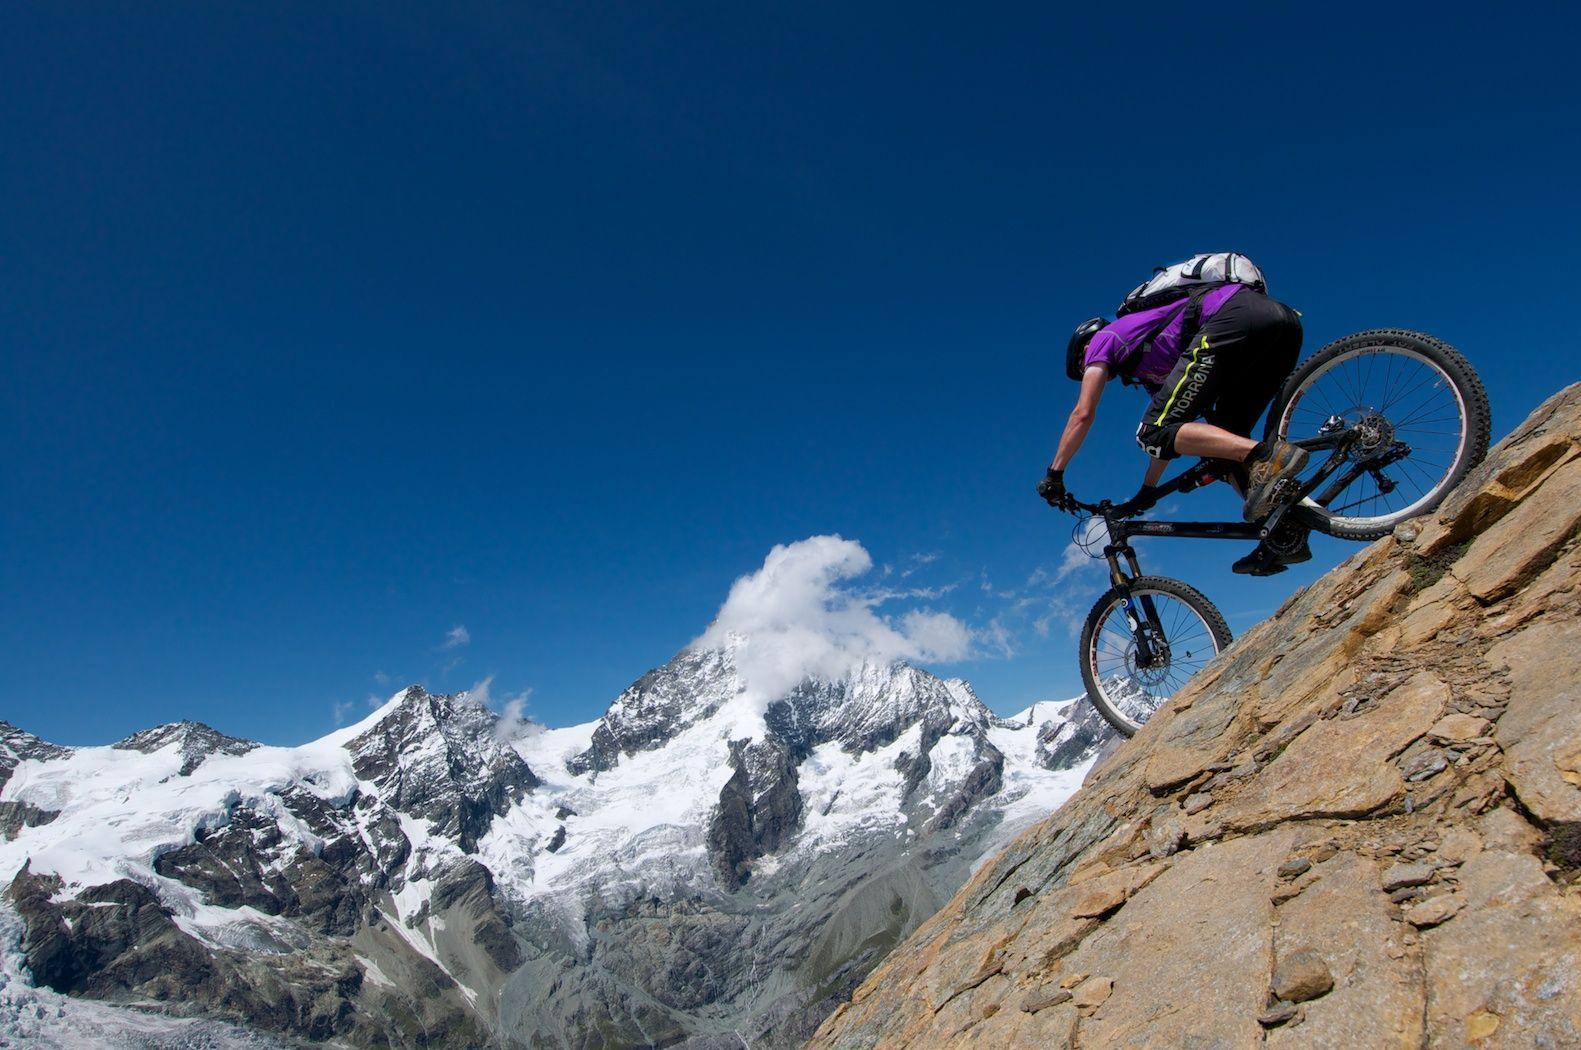 Extreme mountainbiking in the Alps #mtb #bike #mountainbike #extreme #outdoor #alps #downhill